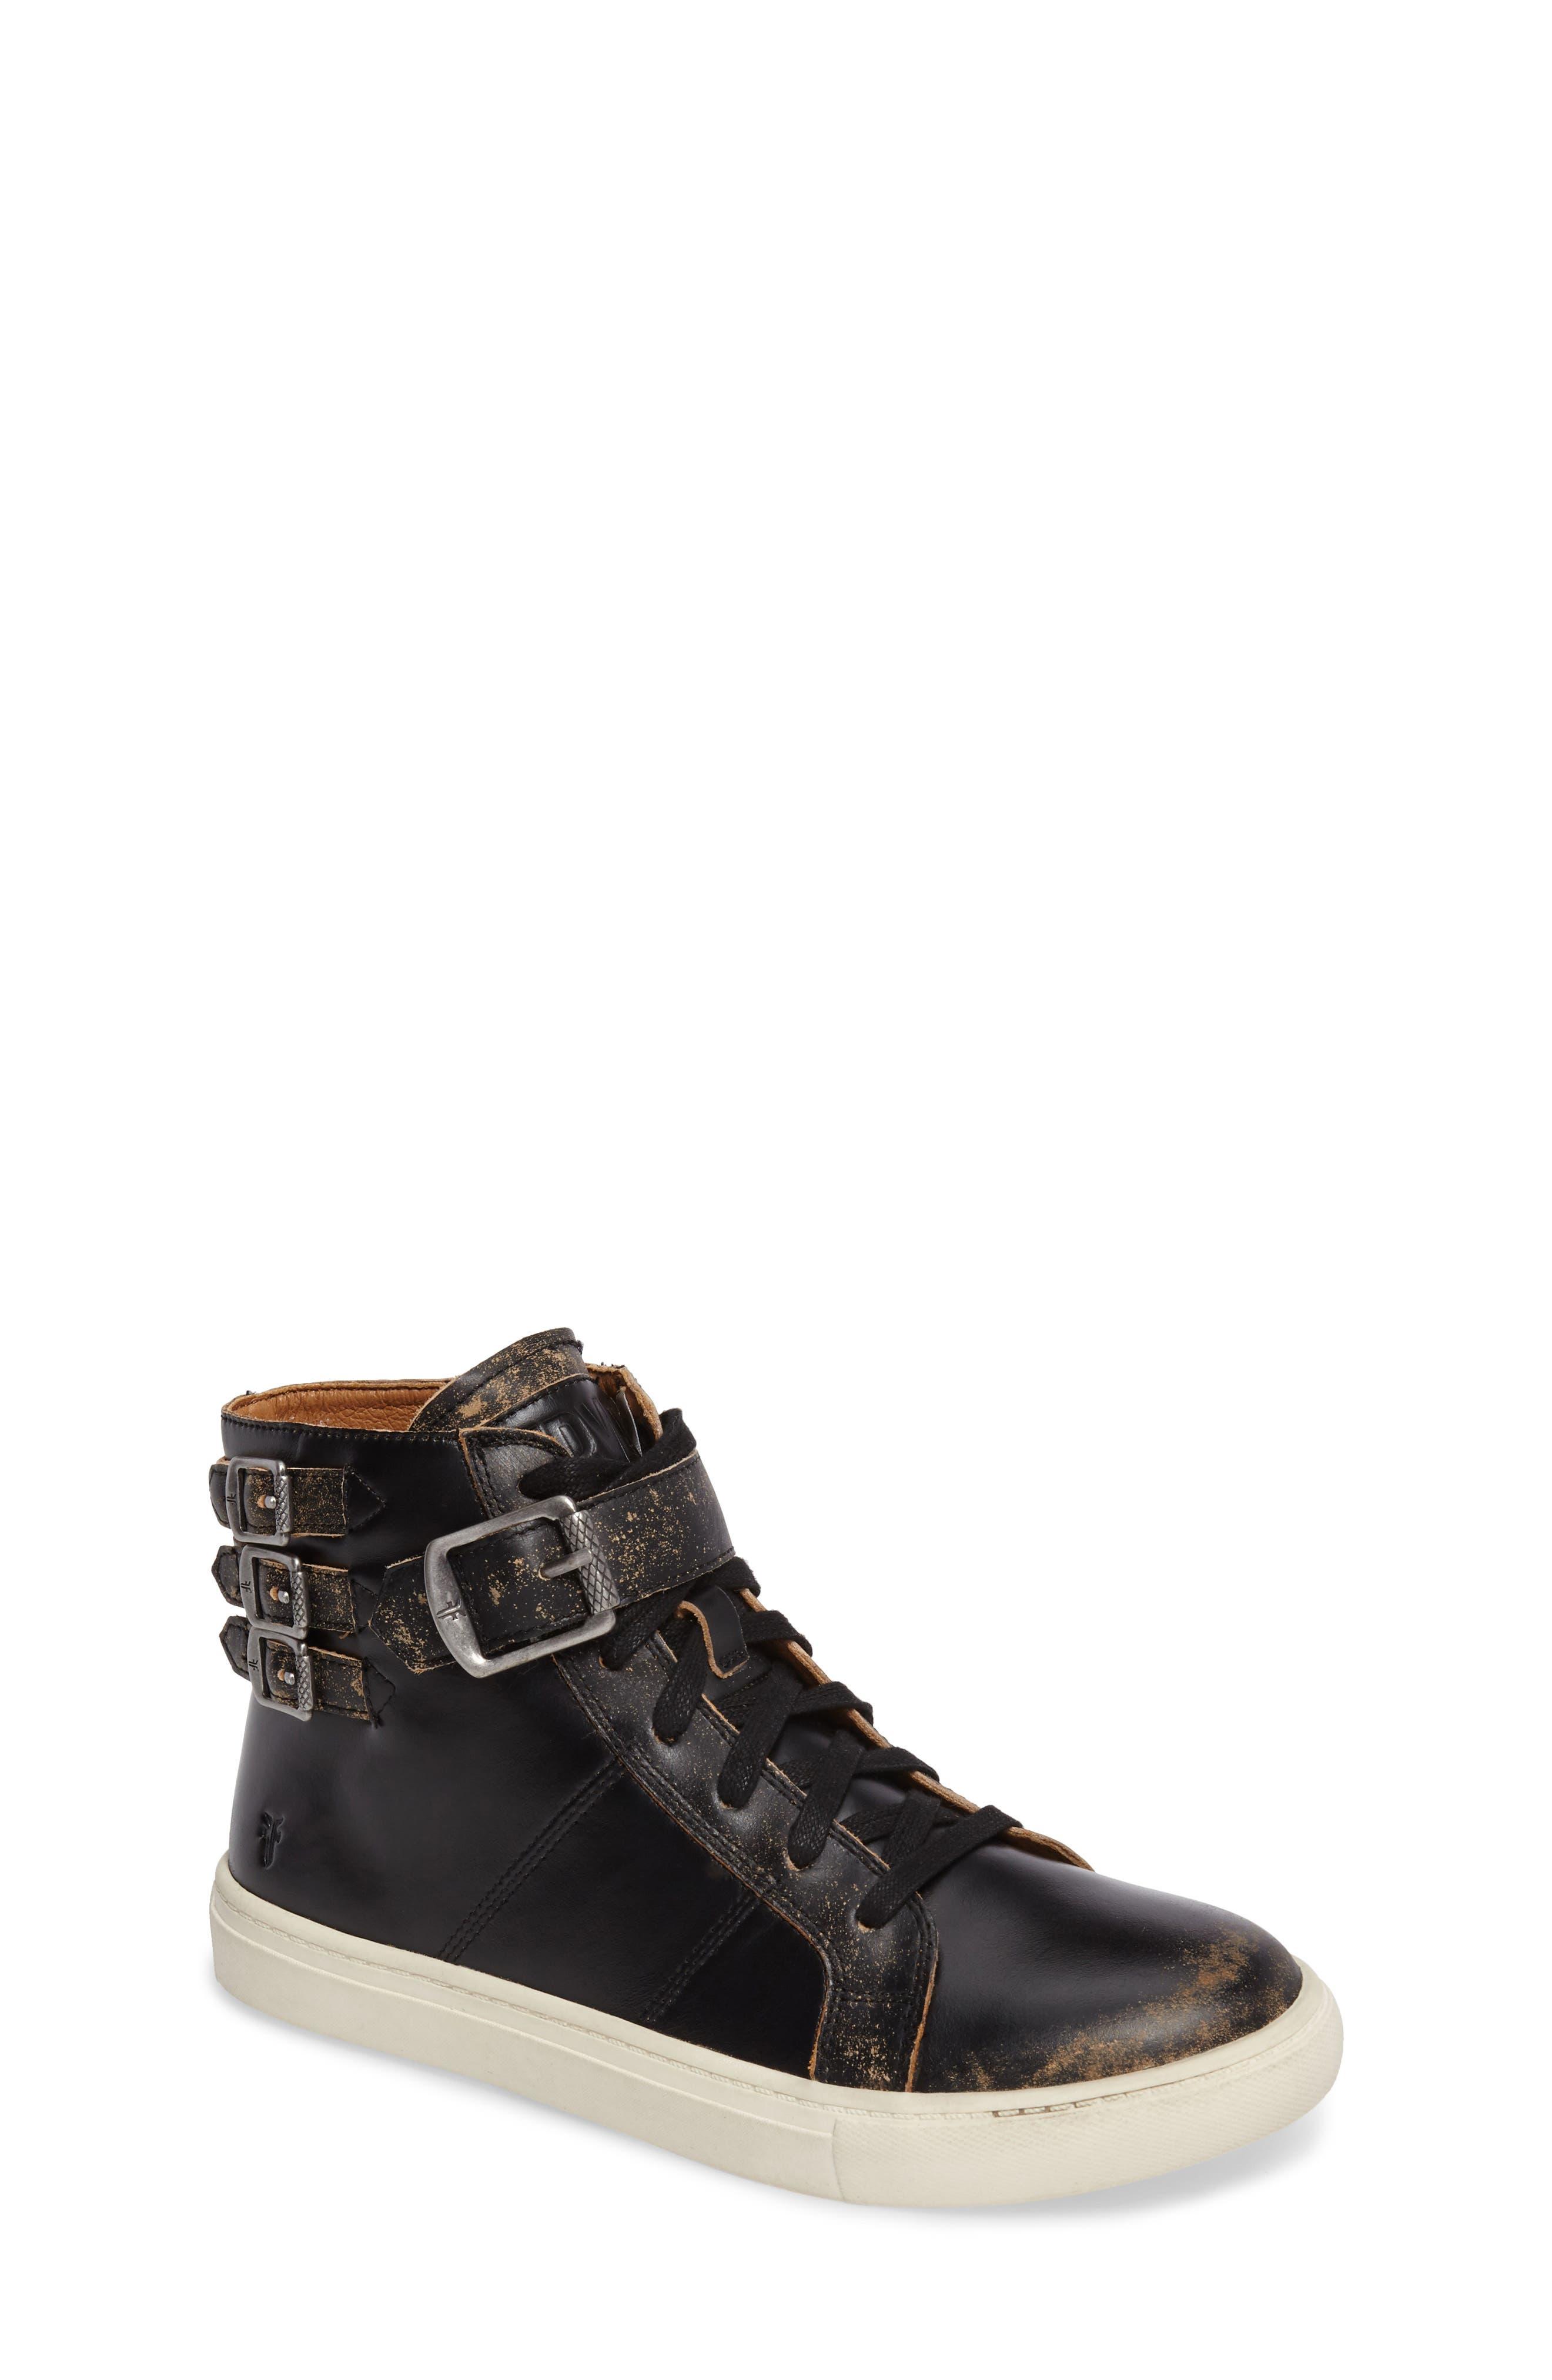 Frye Dylan Buckle Strap High-Top Sneaker (Toddler, Little Kid & Big Kid)